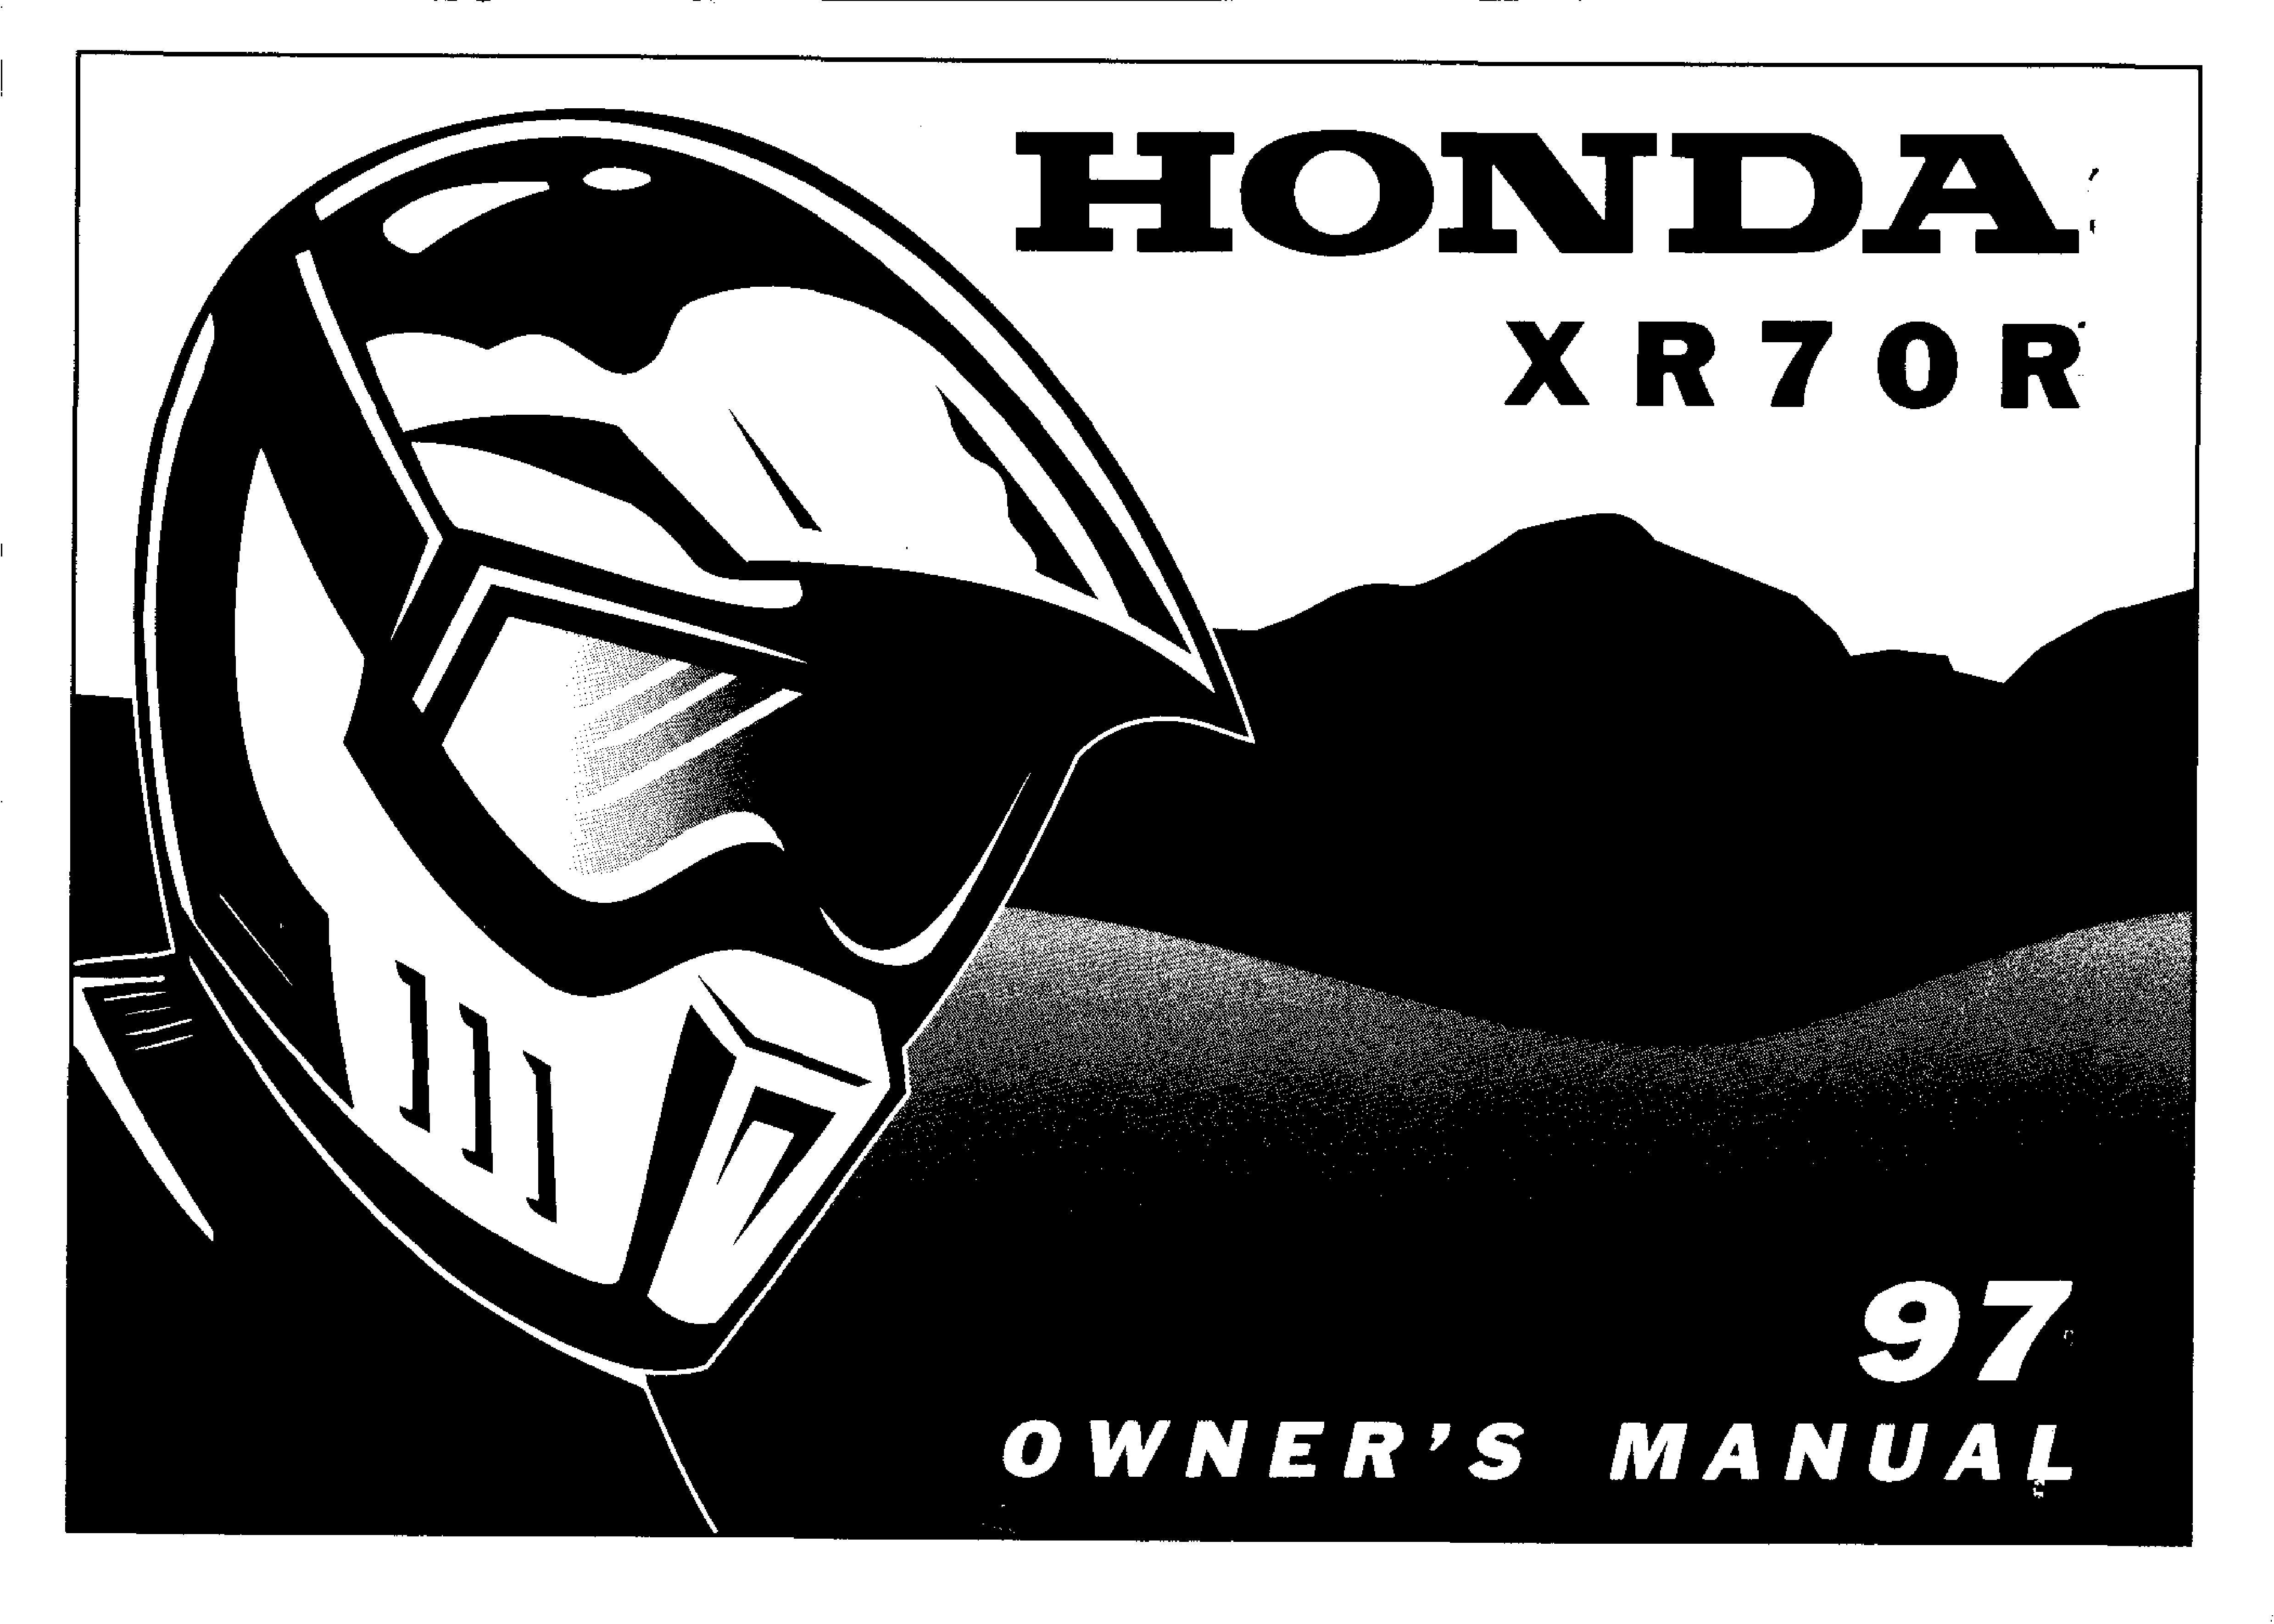 Owner's manual for Honda XR70R (1997)